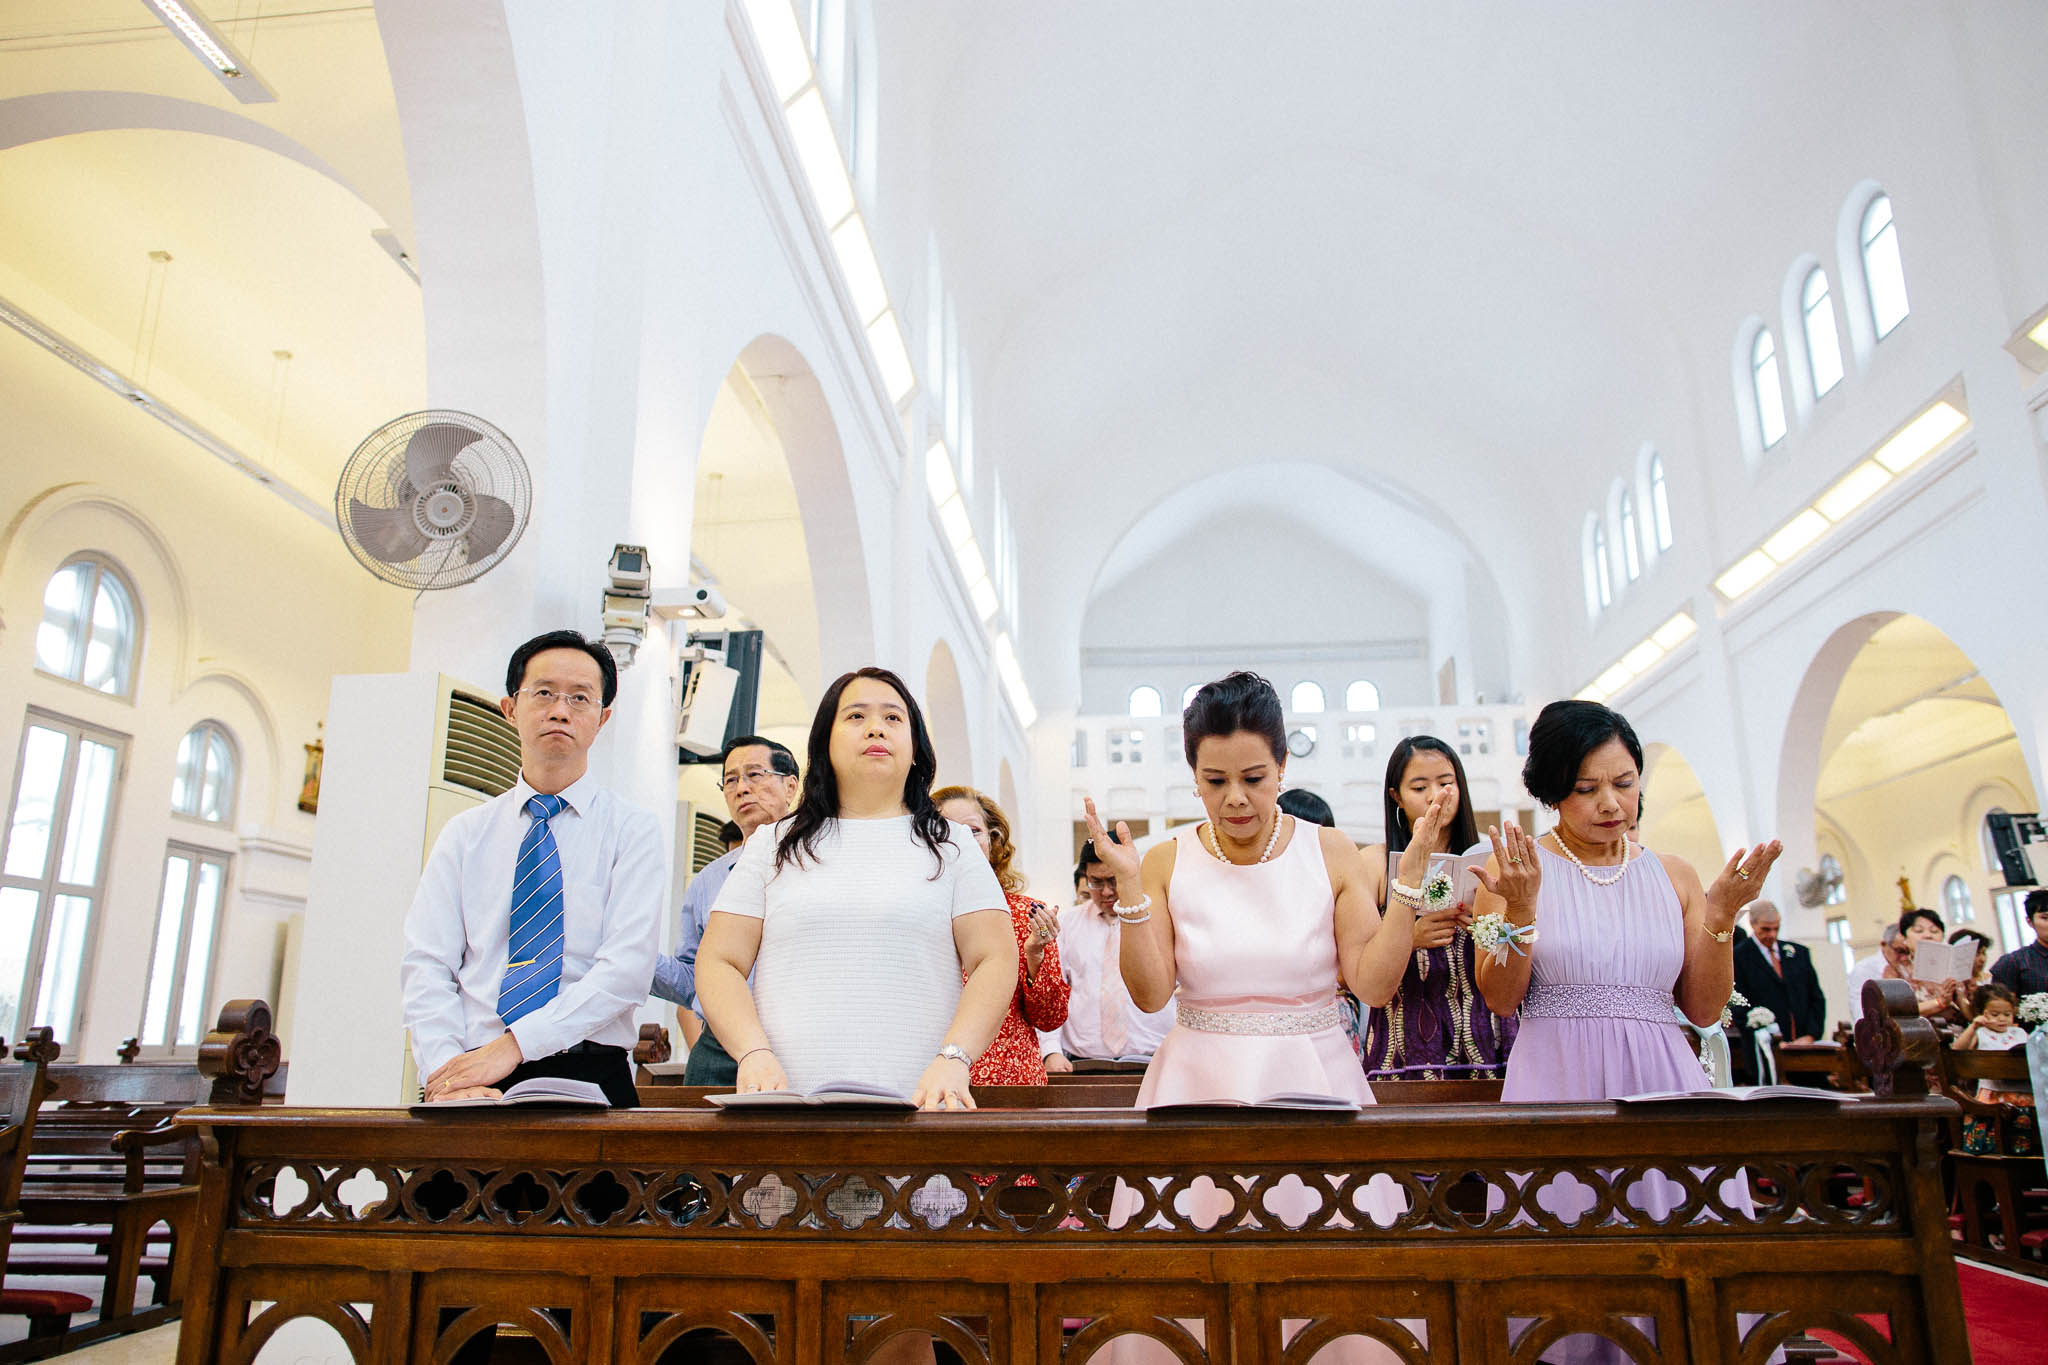 singapore-wedding-photographer-malay-indian-pre-wedding-travel-wmt-2015-jeremy-larissa-41.jpg